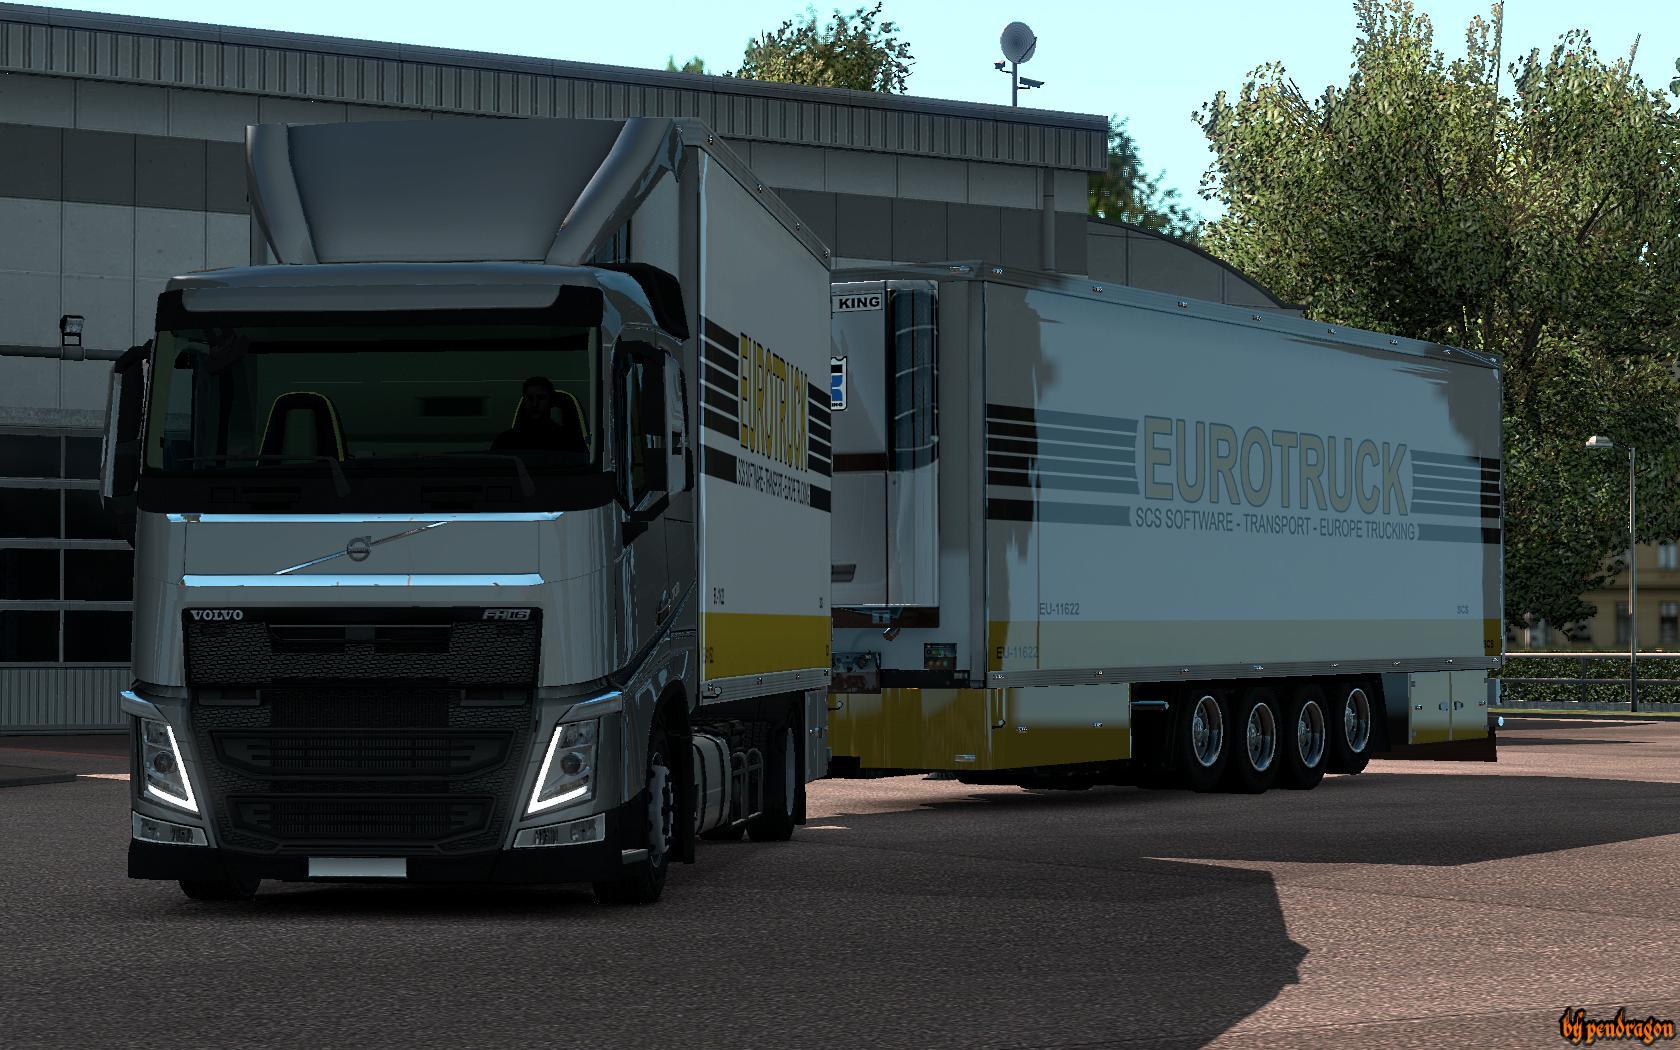 Bdf Addon For Volvo Fh16 2012 V1 4 Tuning Mod Ets2 Mod